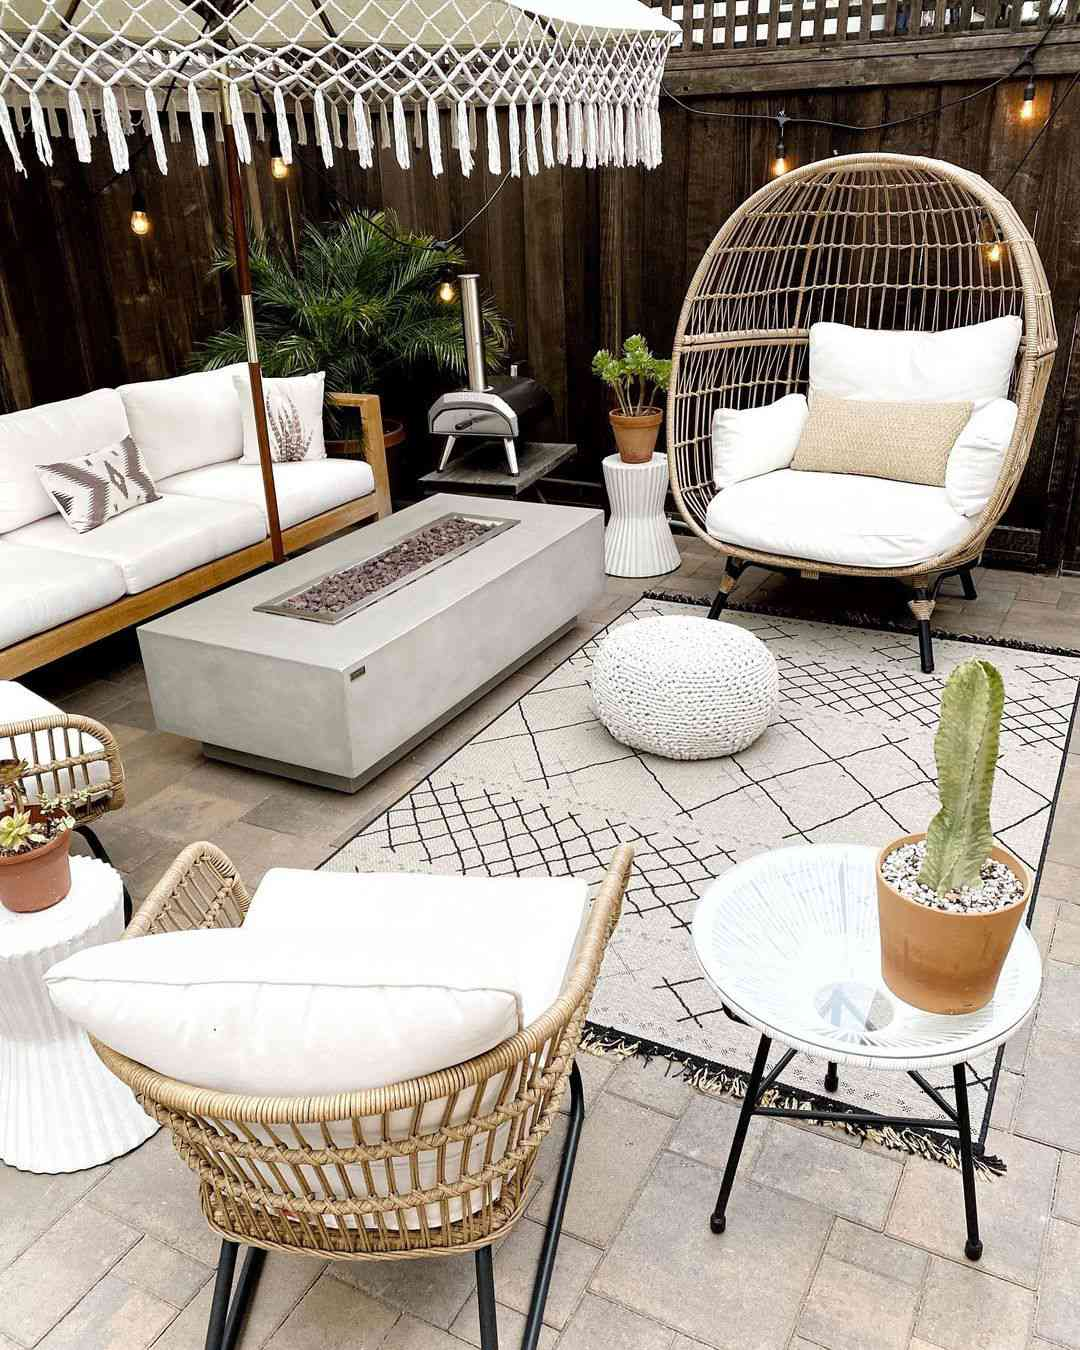 Patio with rattan furniture